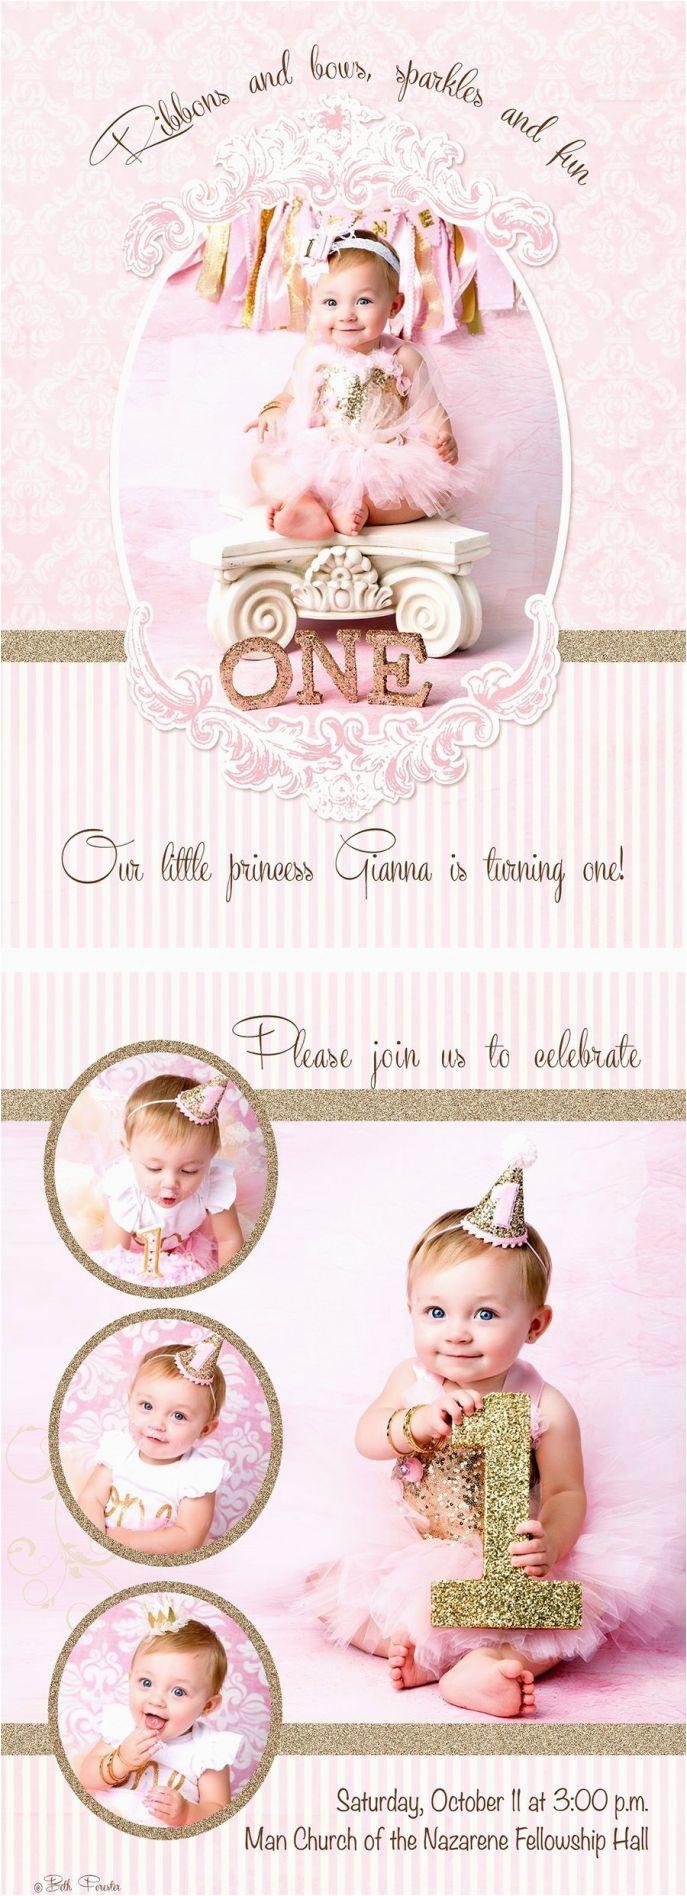 Birthday Free Online 1st Invitation Card Maker